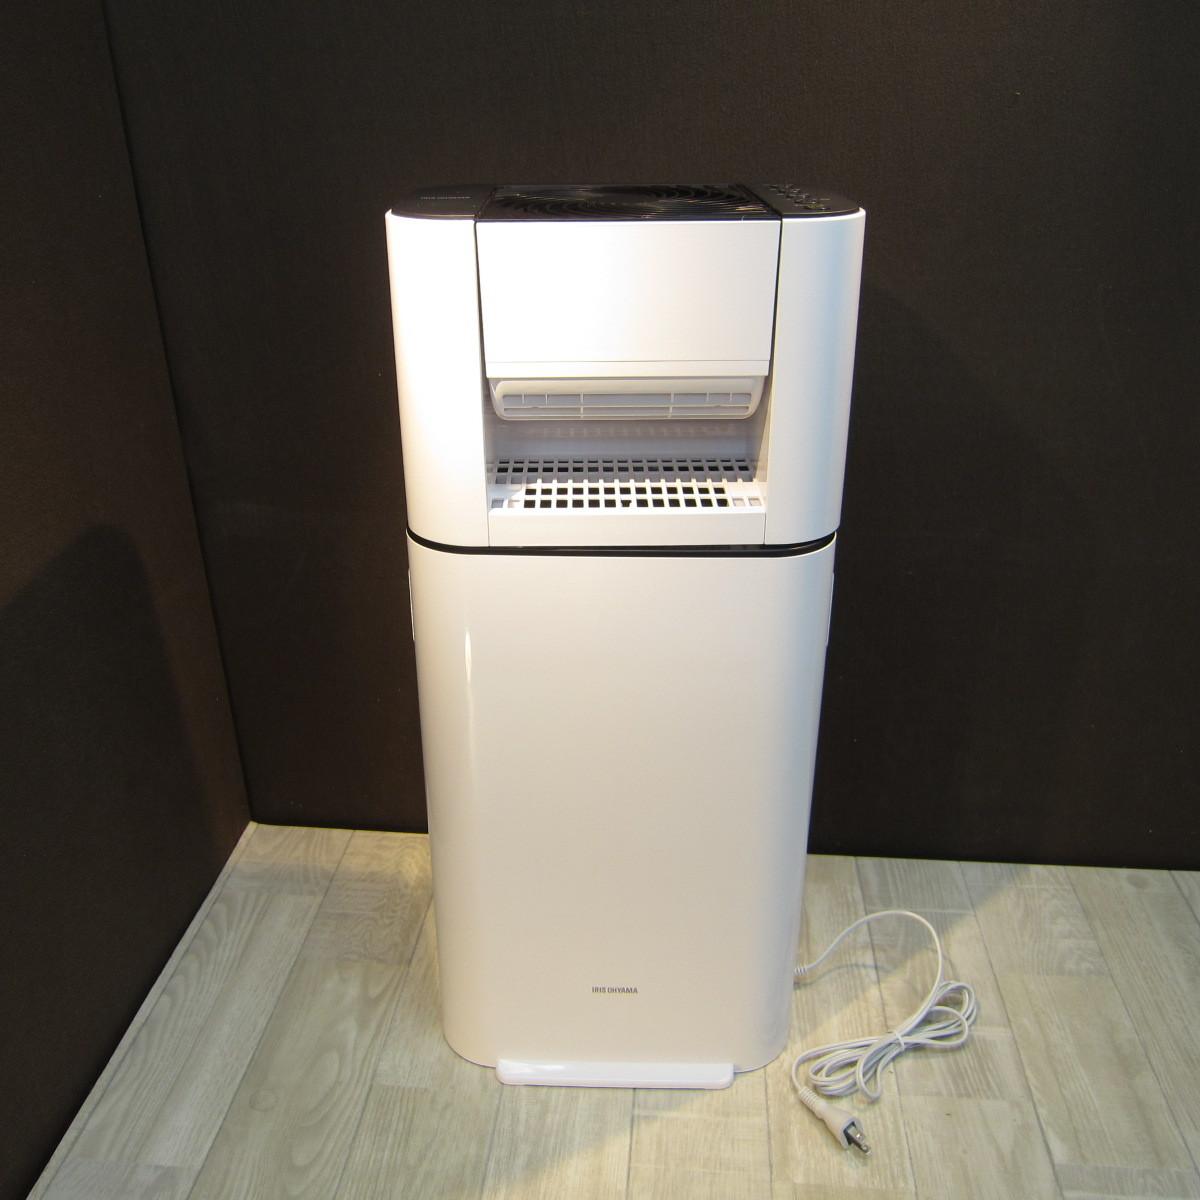 S6081【未使用】アイリスオーヤマ 衣類乾燥除湿機 スピード乾燥 サーキュレーター機能付 デシカント式 ホワイト IJD-I50_画像2